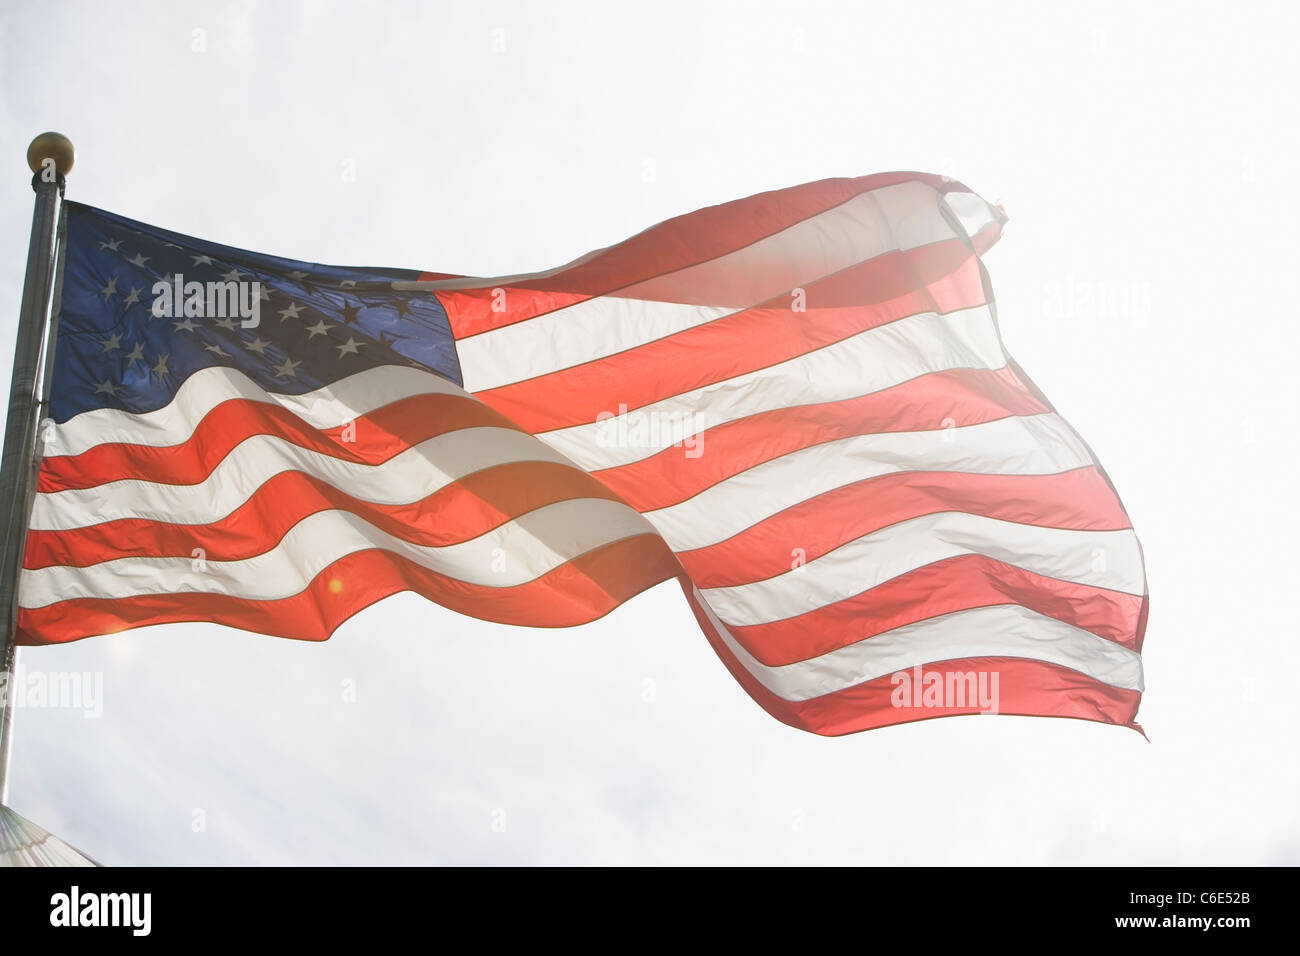 USA, New York State, New York City, American flag against sky - Stock Image